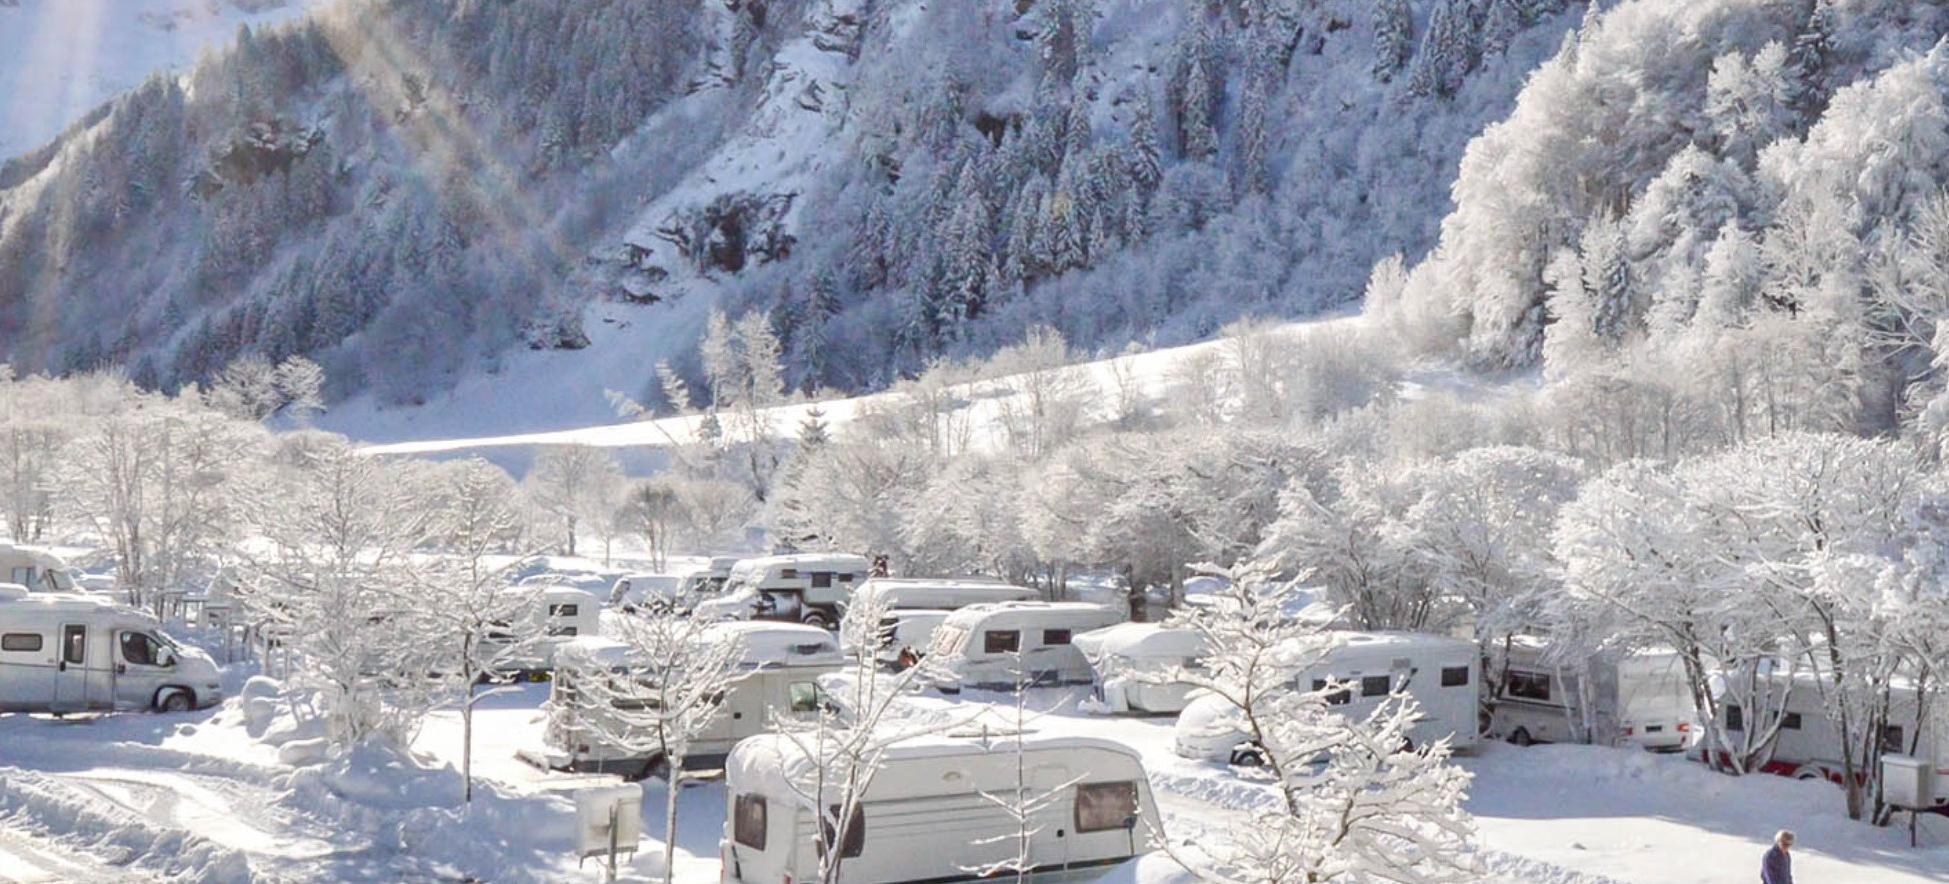 wintercamping-campingplatz-eienwaeldli